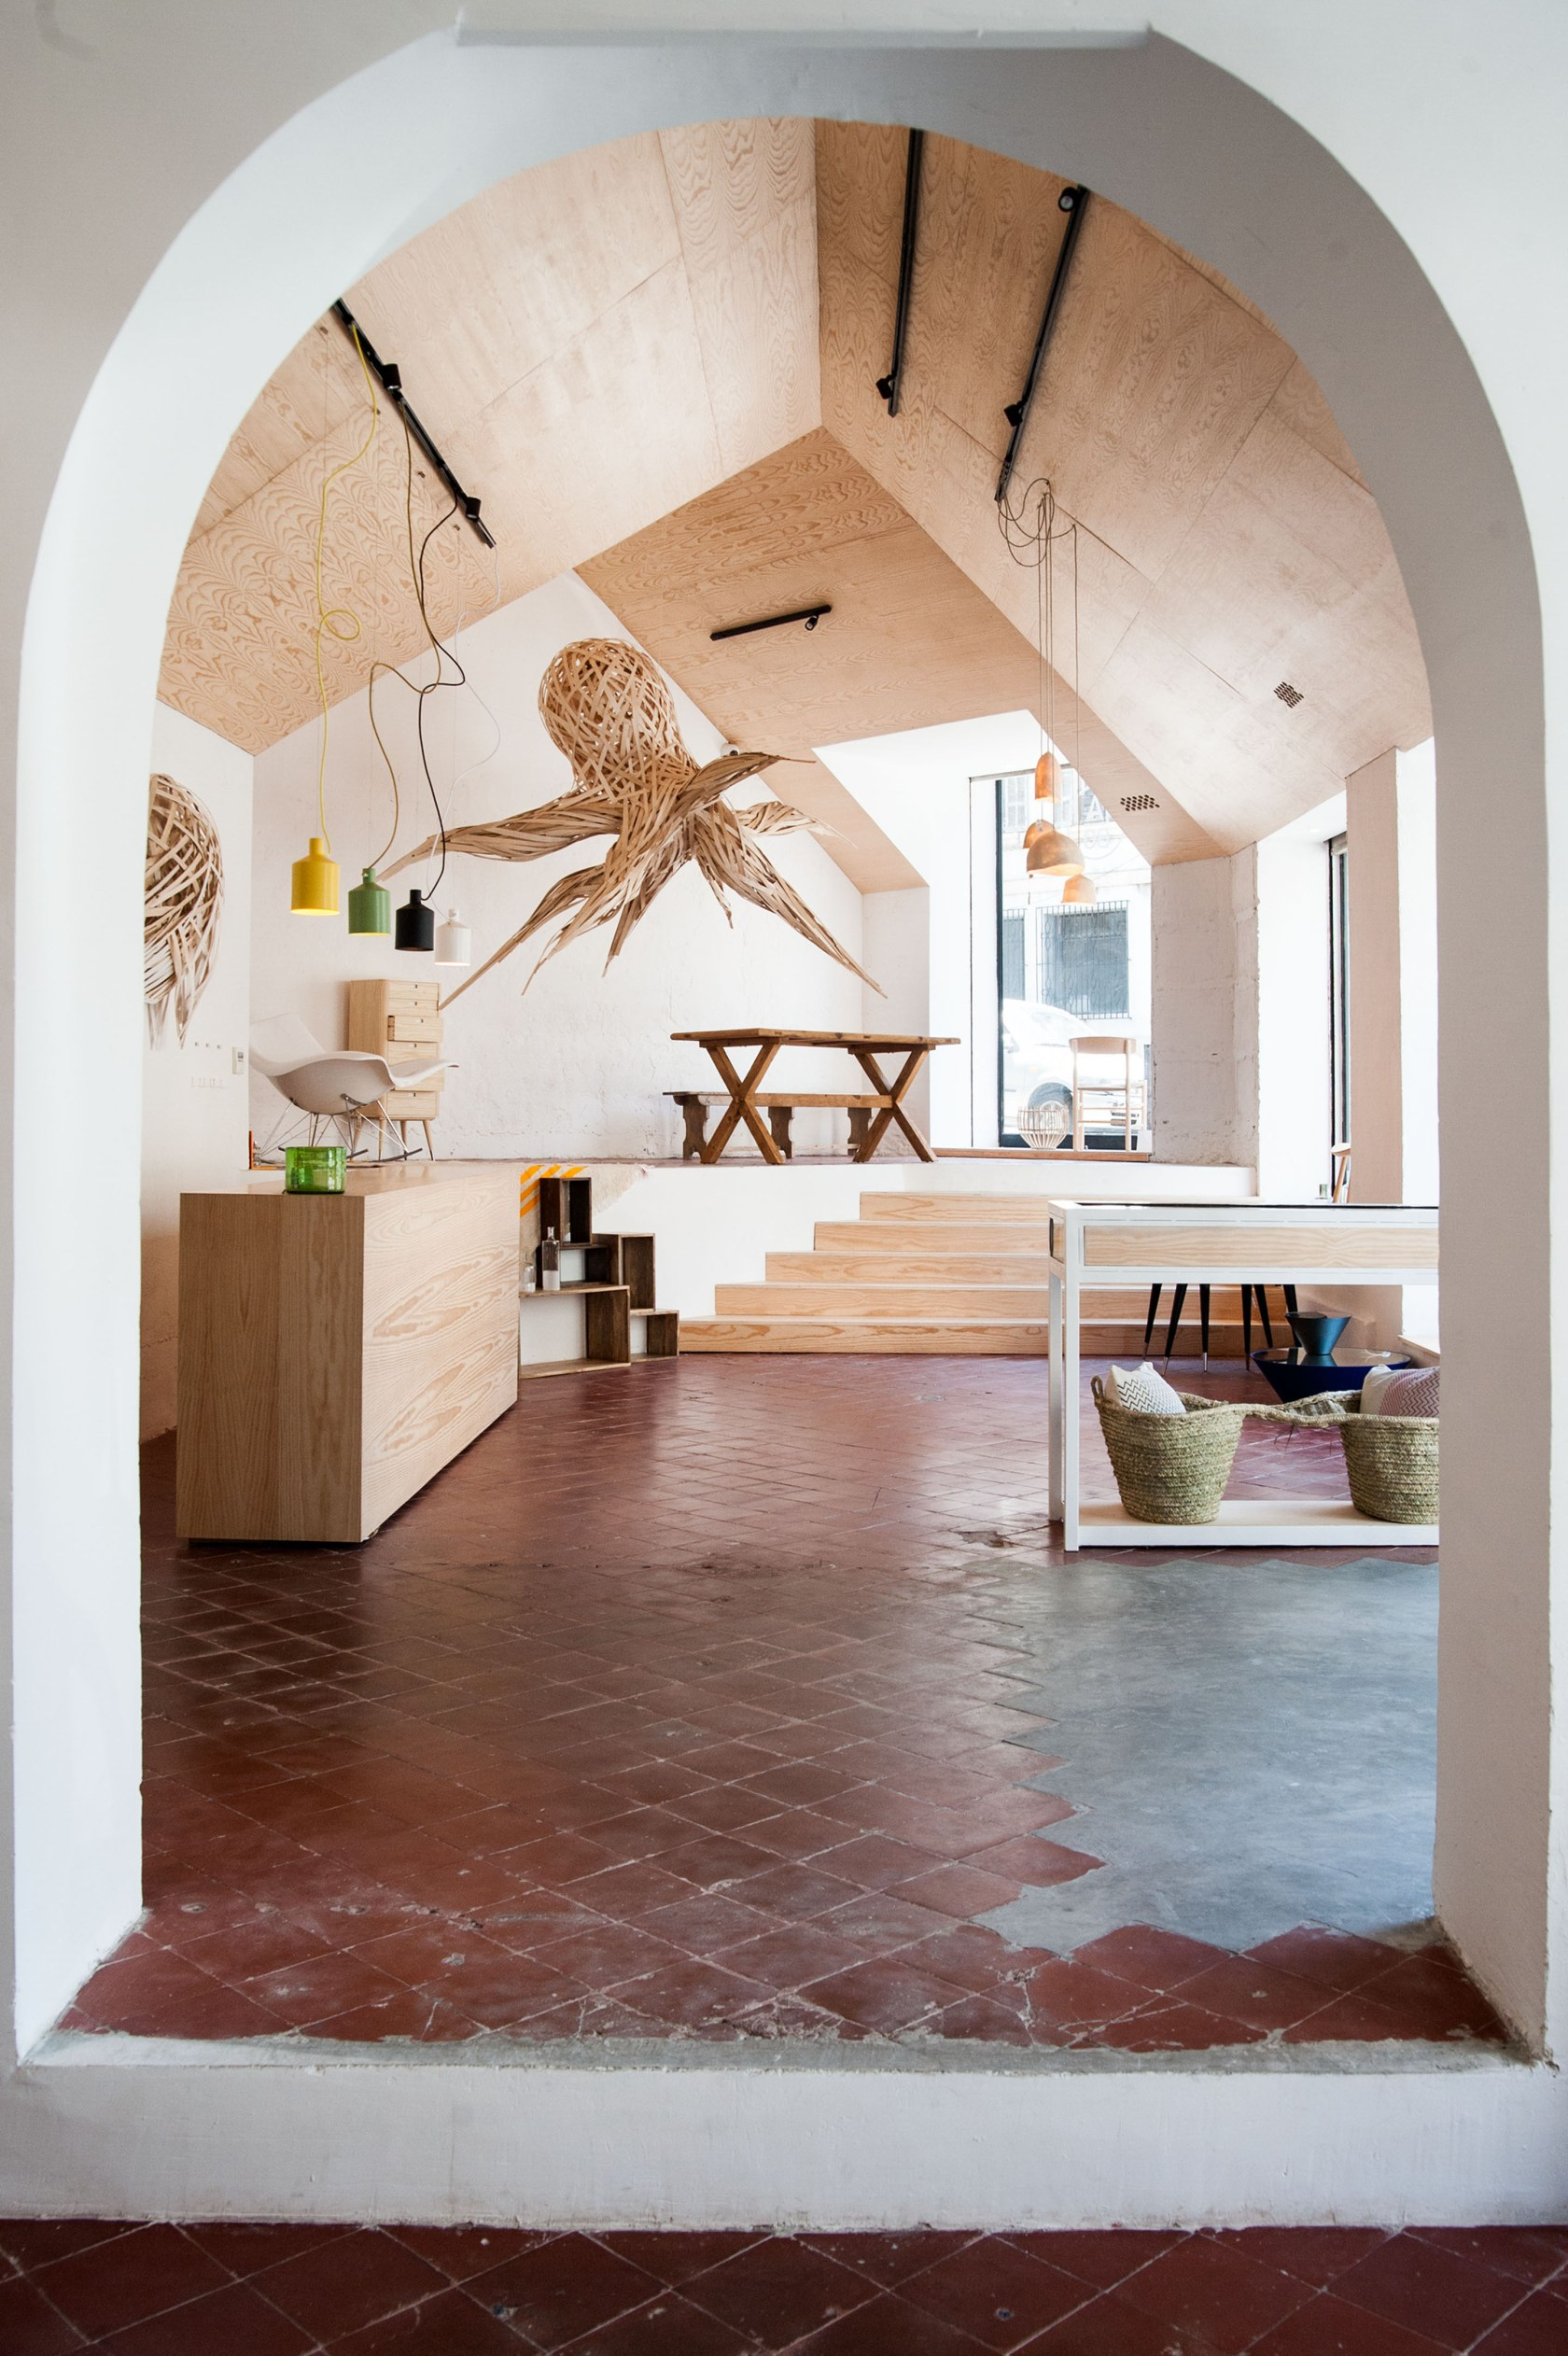 Labo Lifestore And Exhibition Space - Architizer